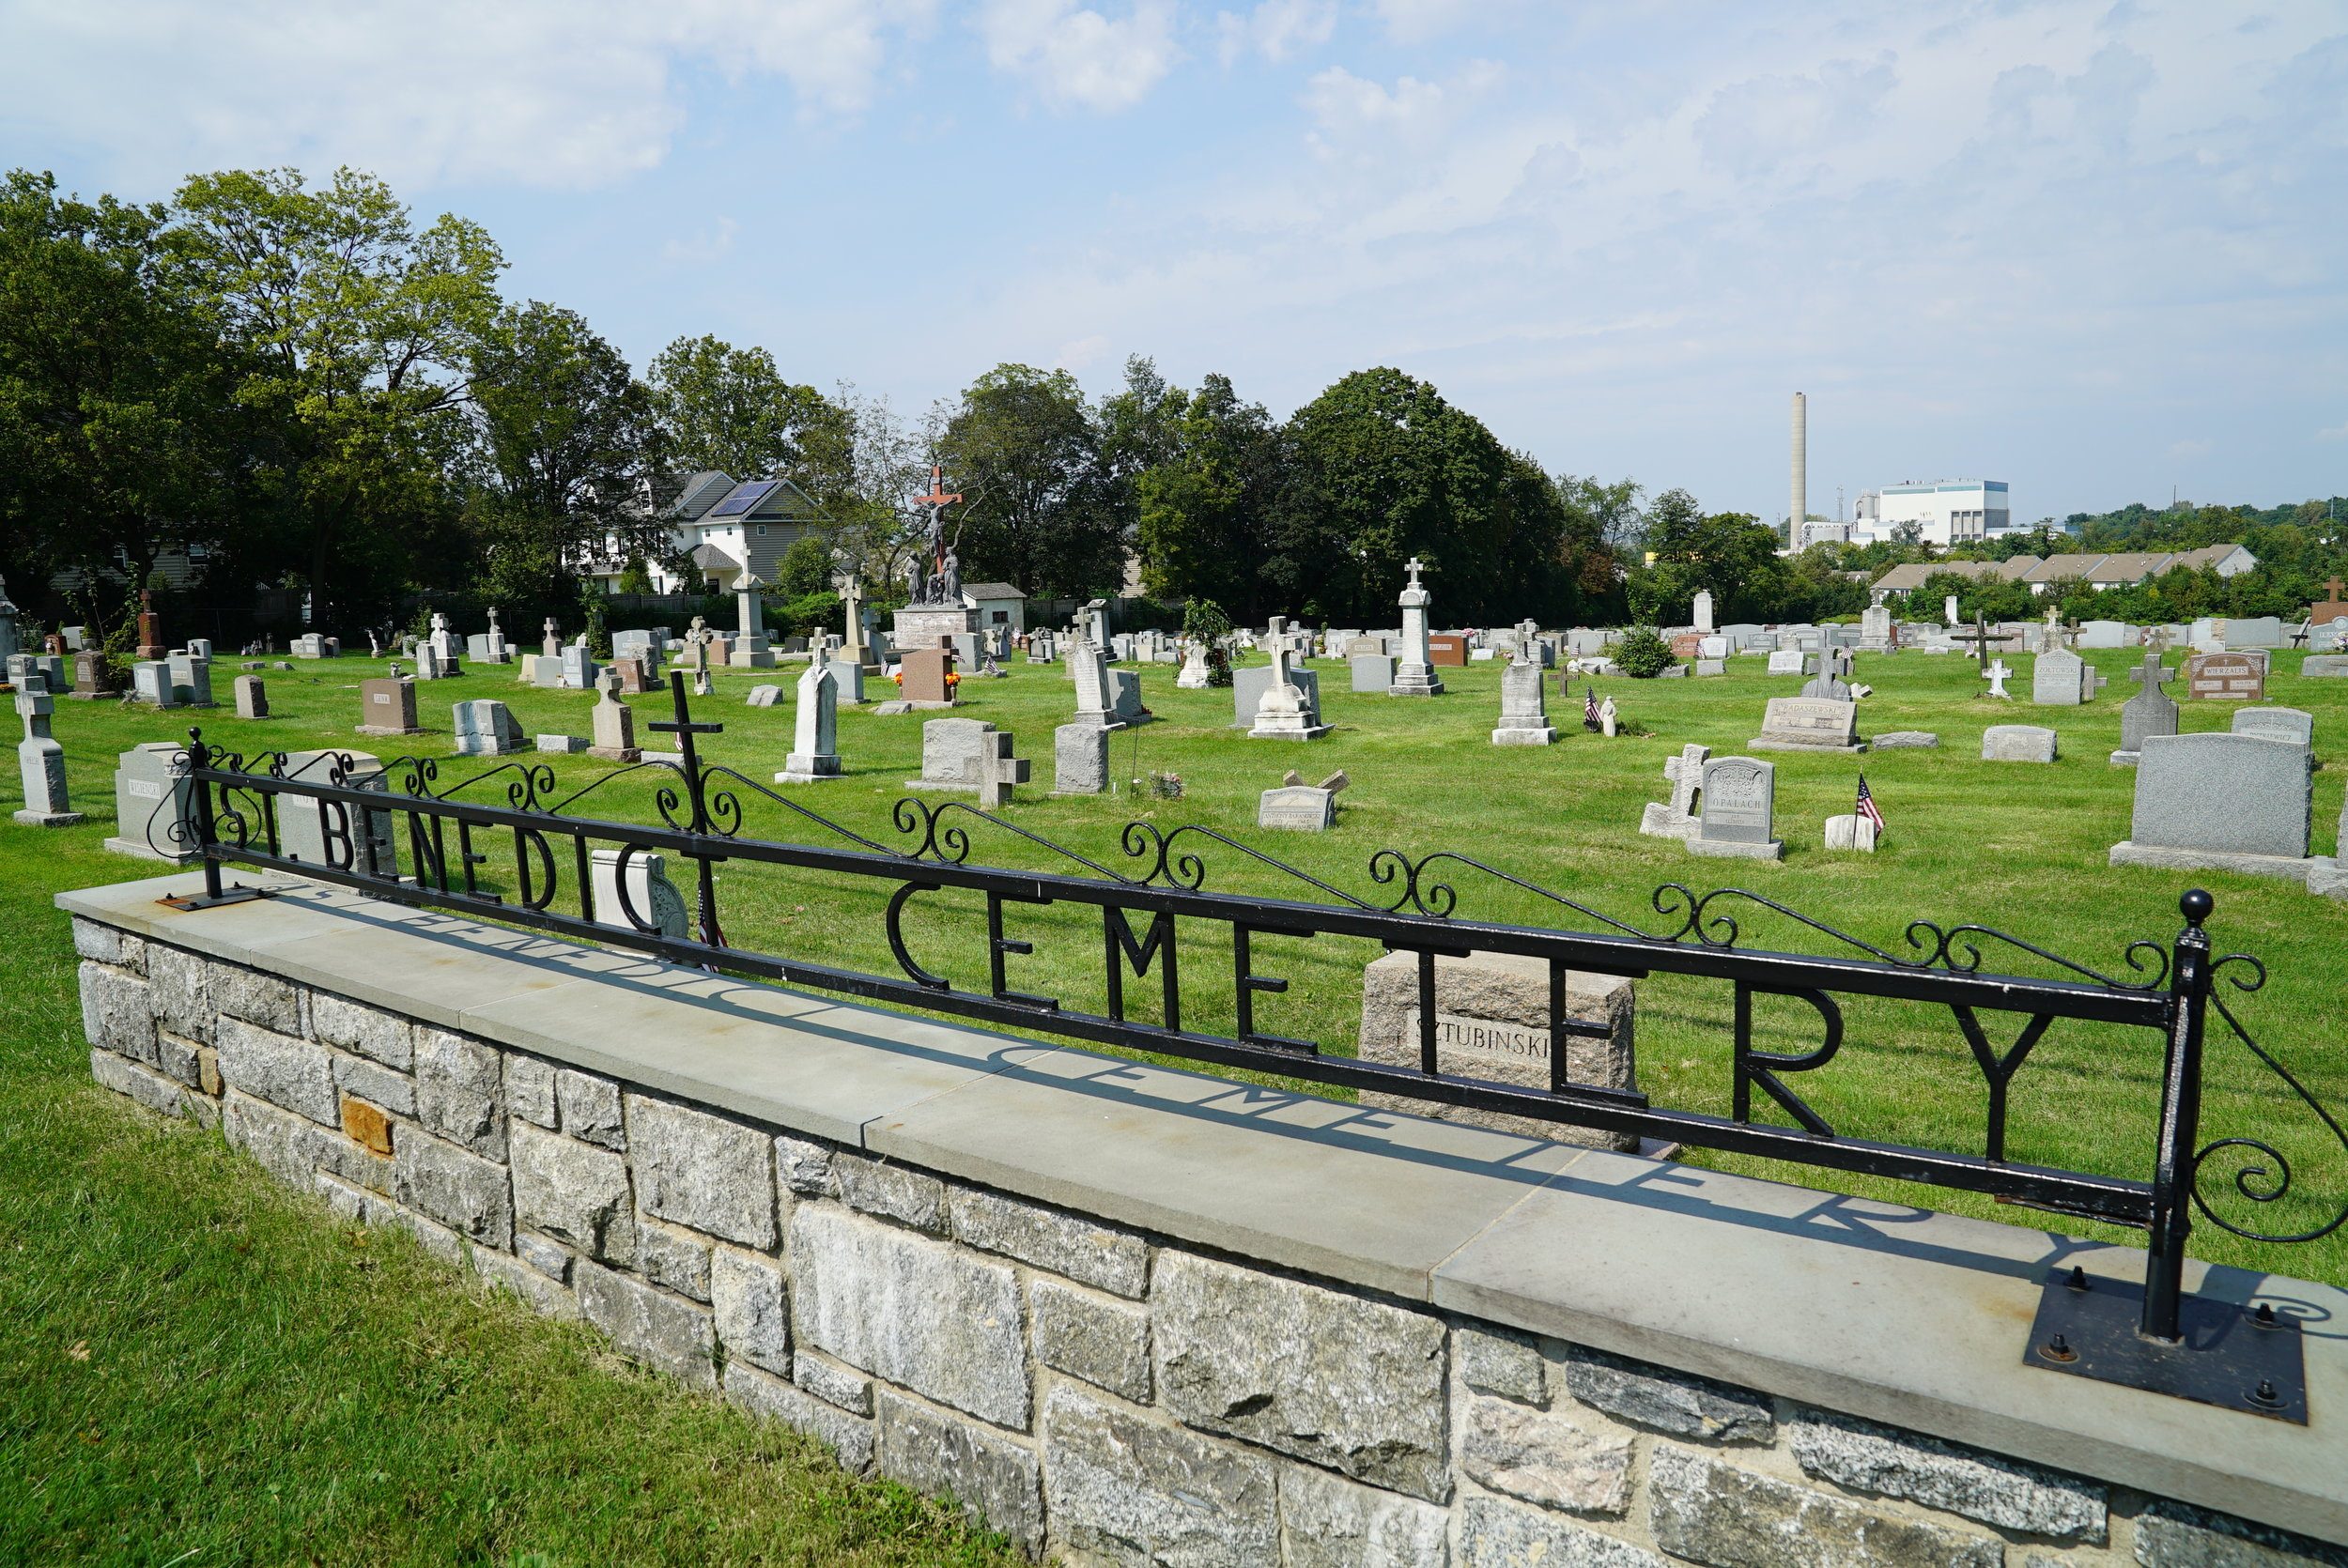 St. Benedict Cemetery. Conshohocken, Pennsylvania.